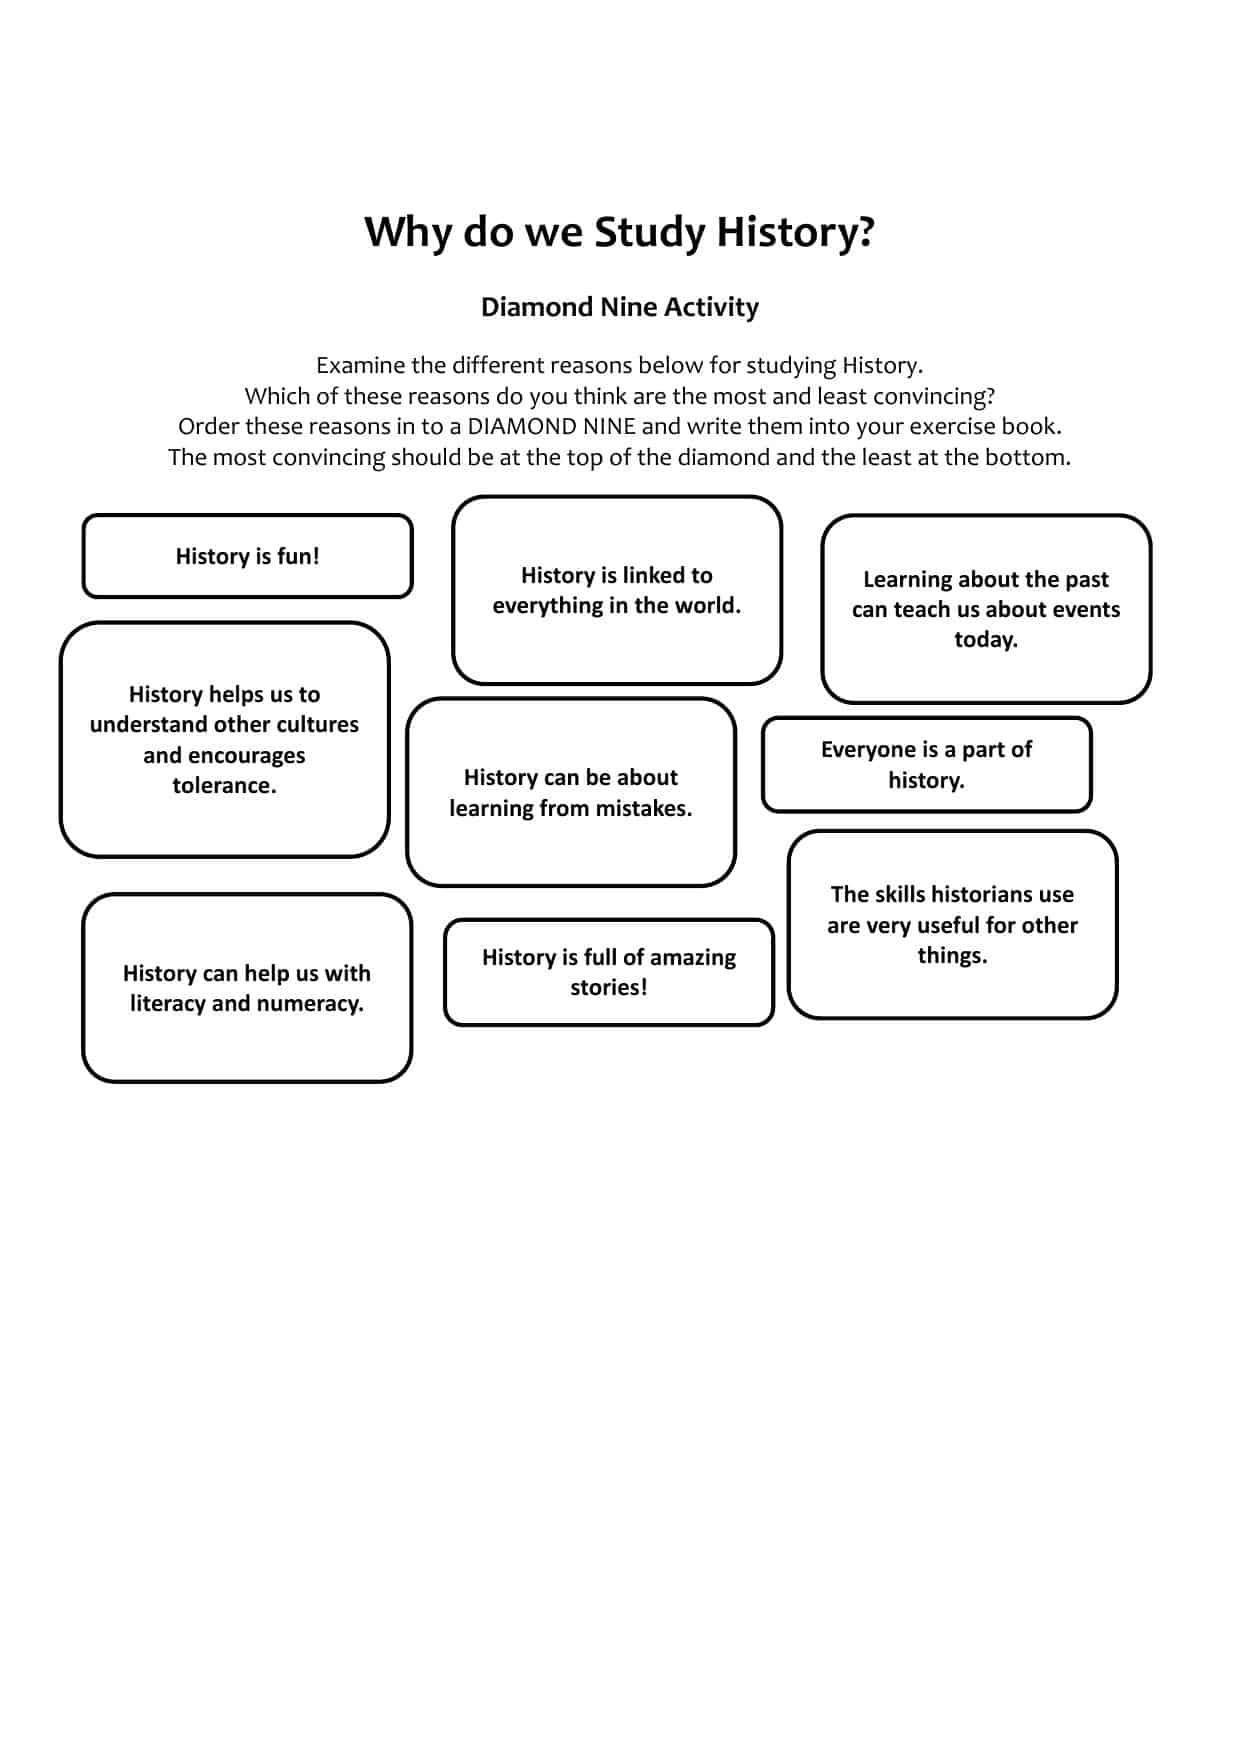 Why Do We Study History Activity Worksheet